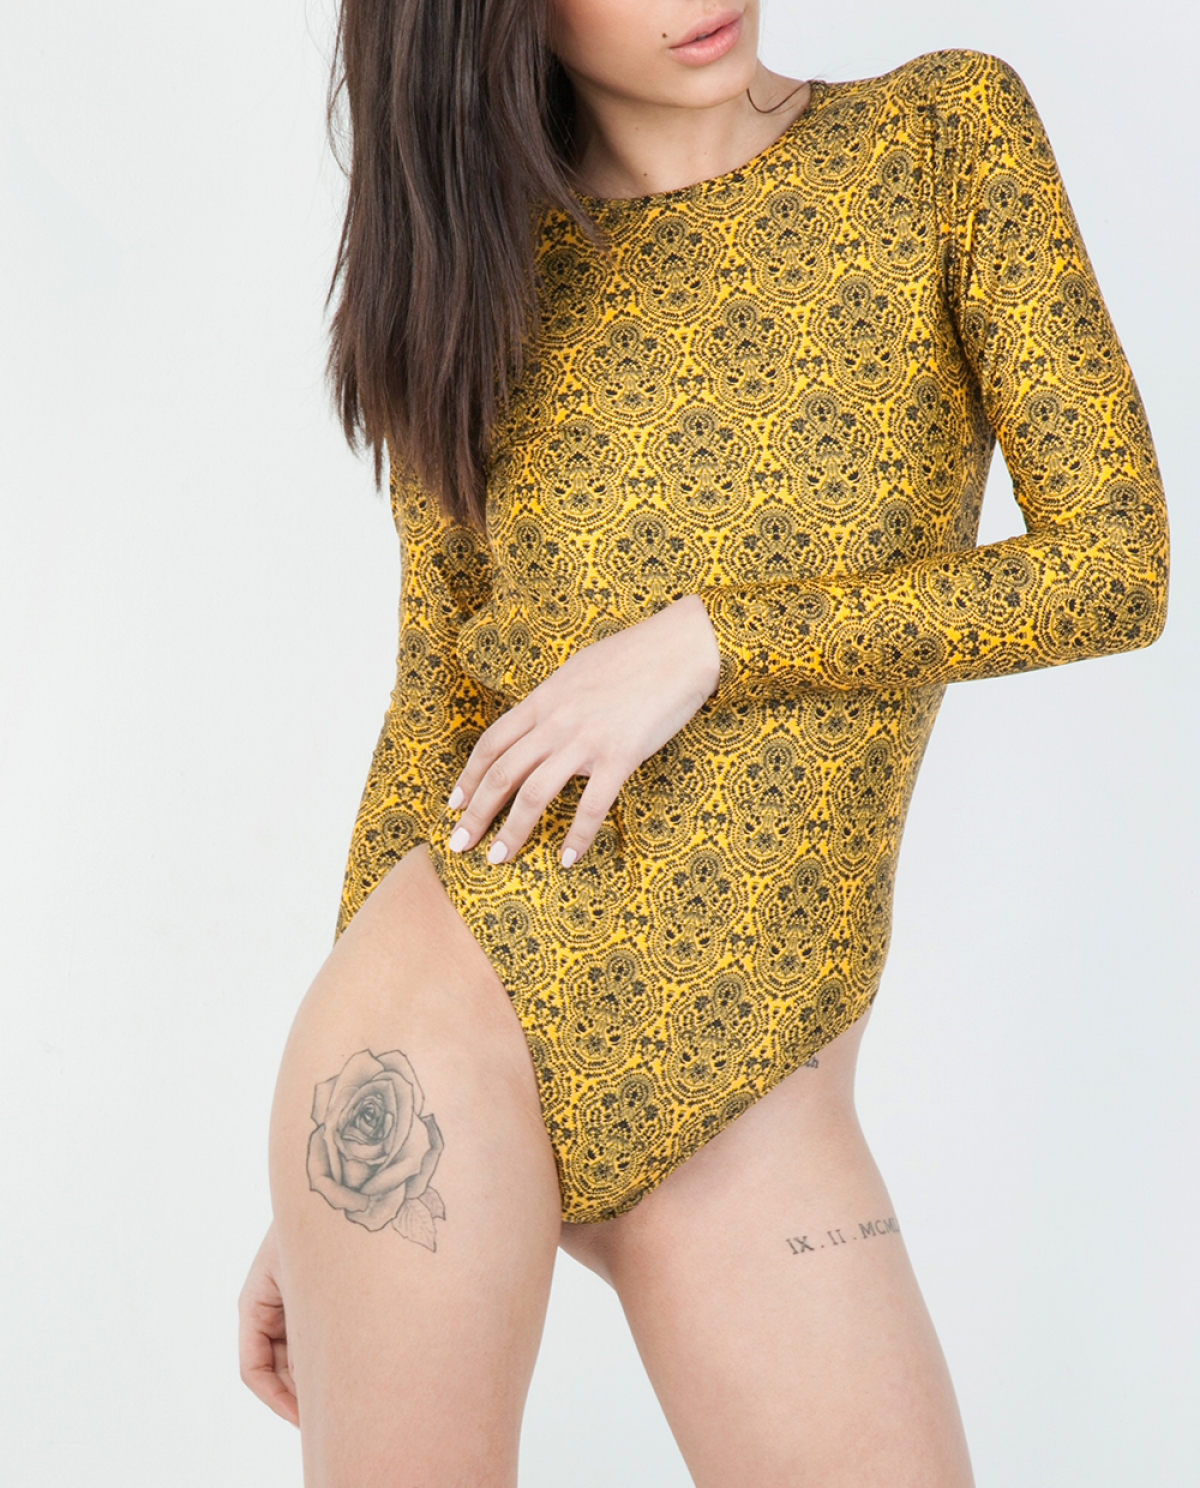 Zara Lorelai Long-sleeve Swimsuit